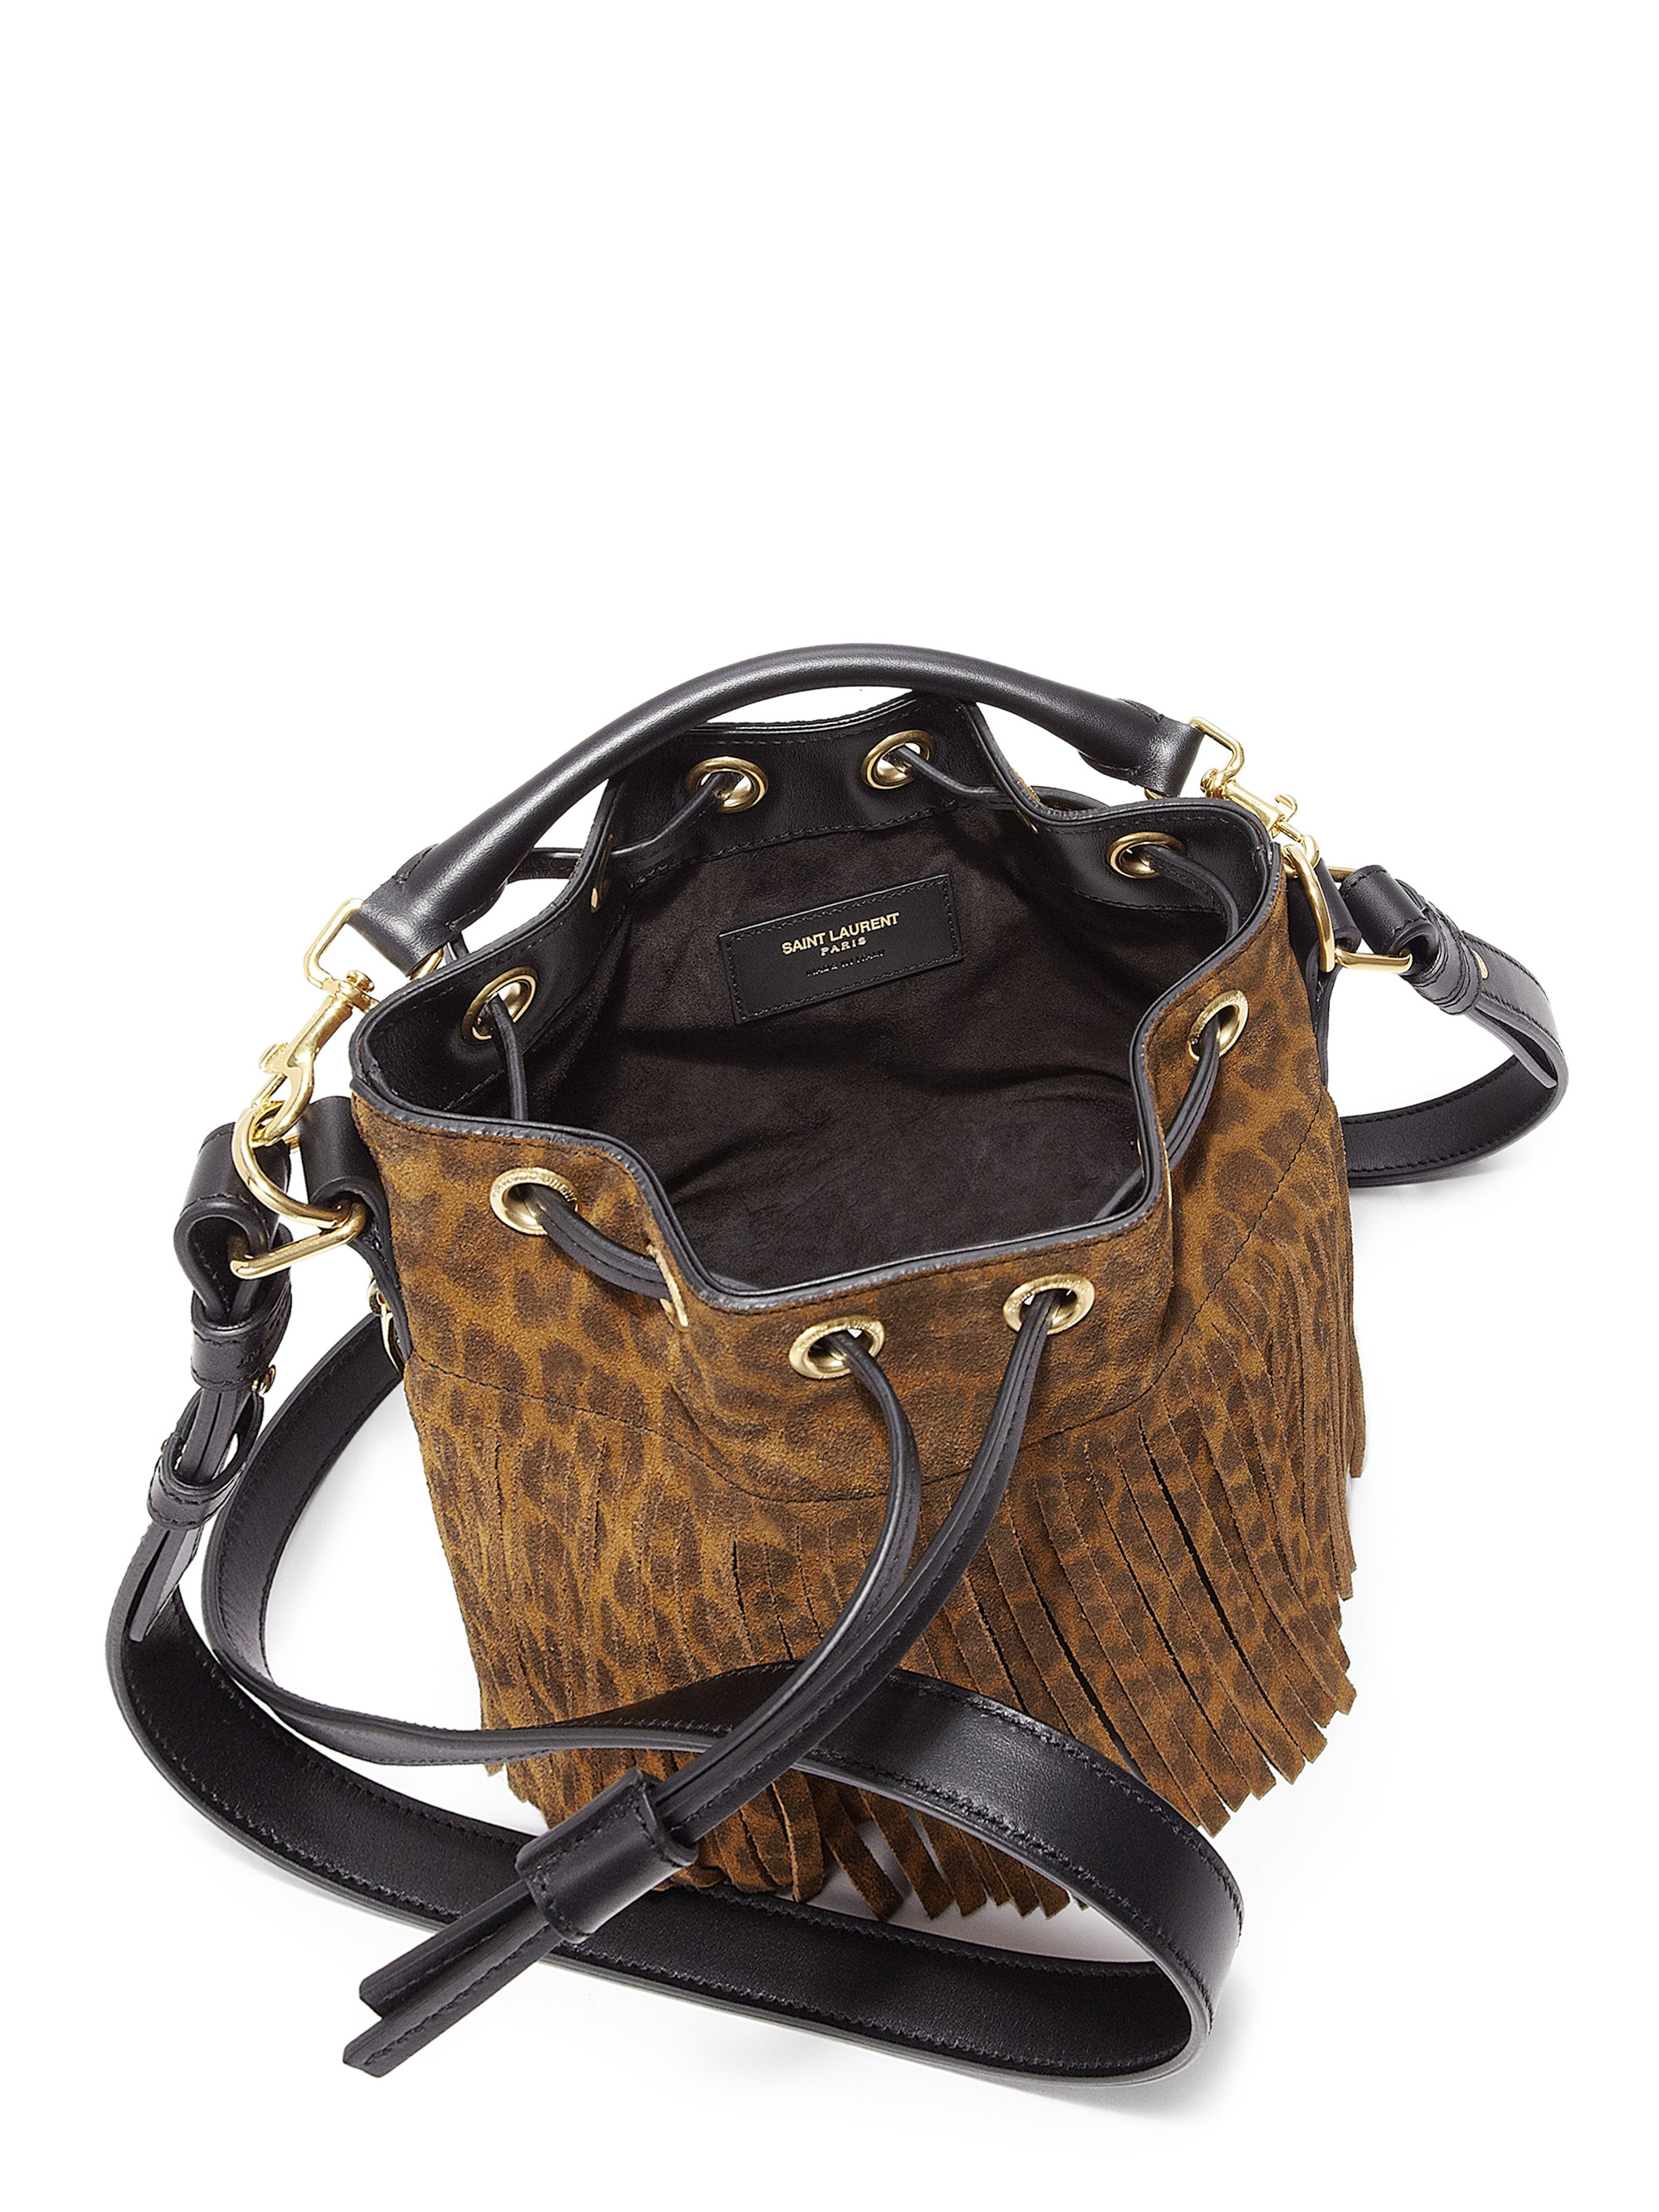 7b994b5f12 Saint Laurent Small Leopard-print Suede Fringe Bucket Bag - Lyst